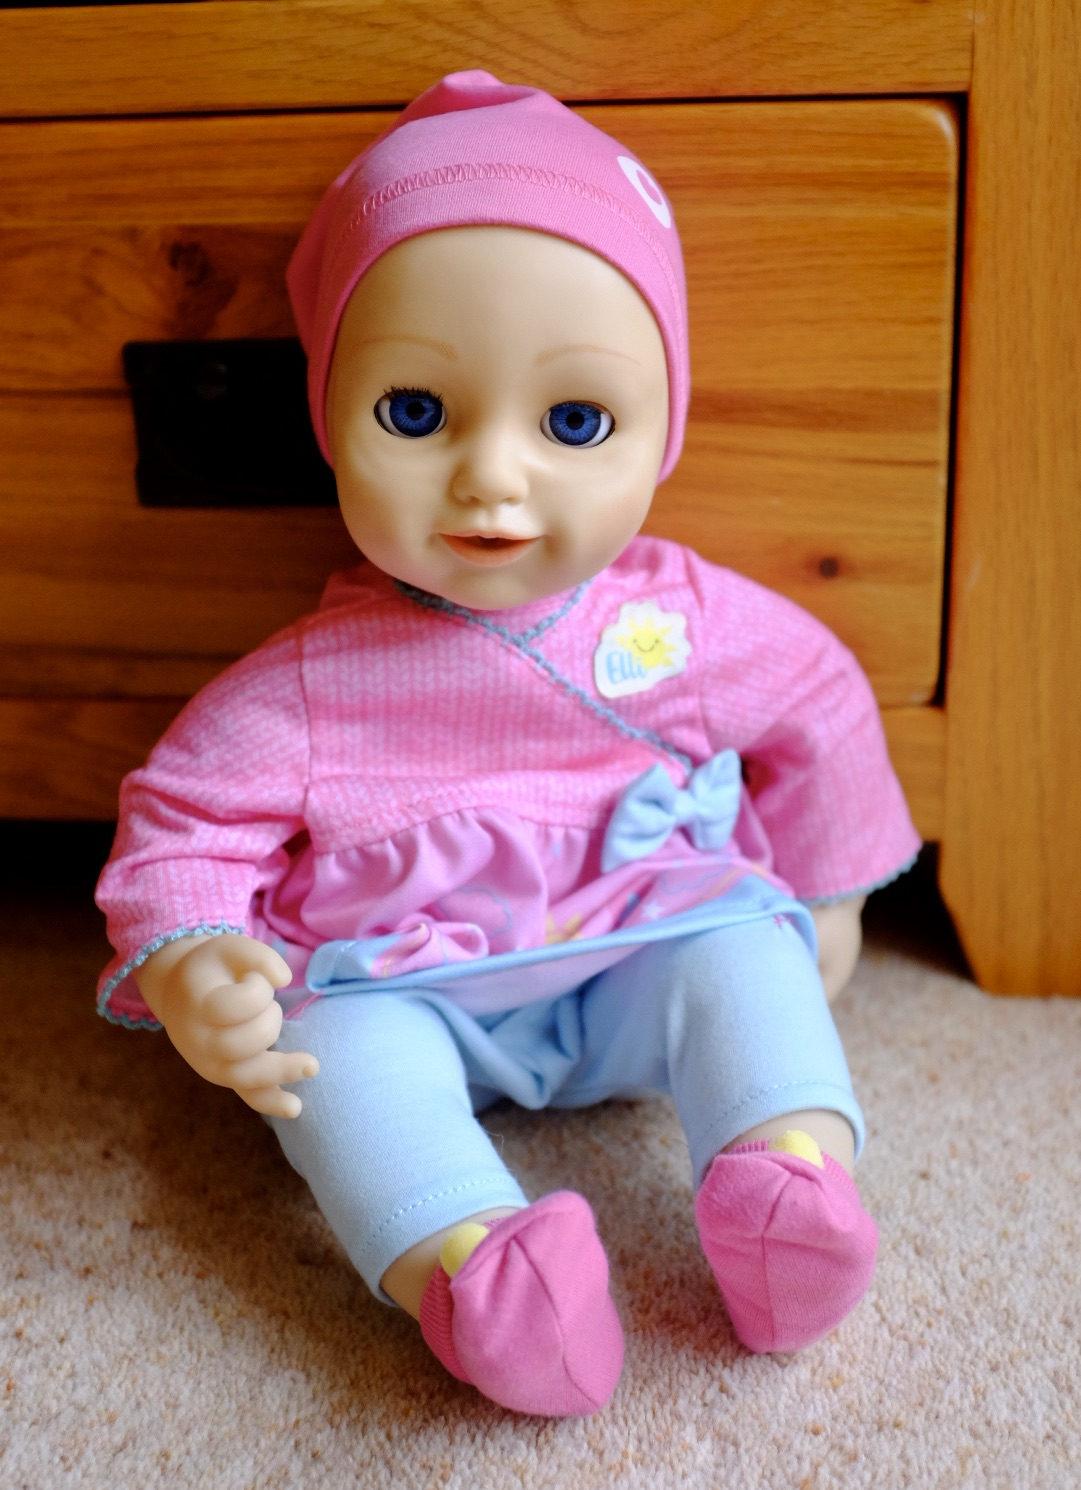 Elli Smiles Doll sat up